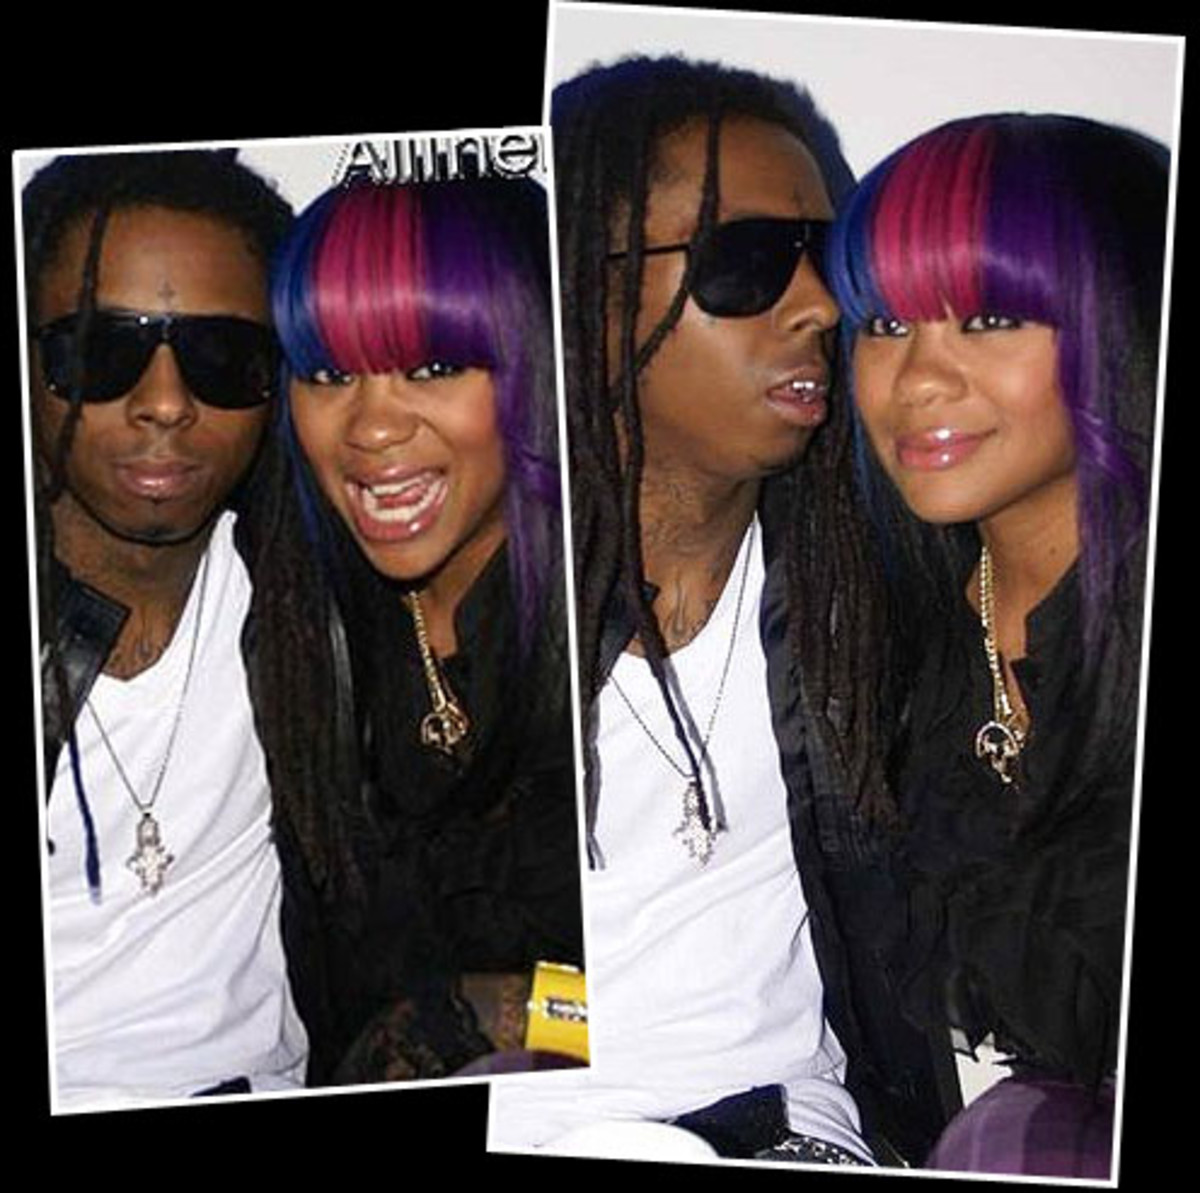 Lil Wayne And Nivea Looking Happy